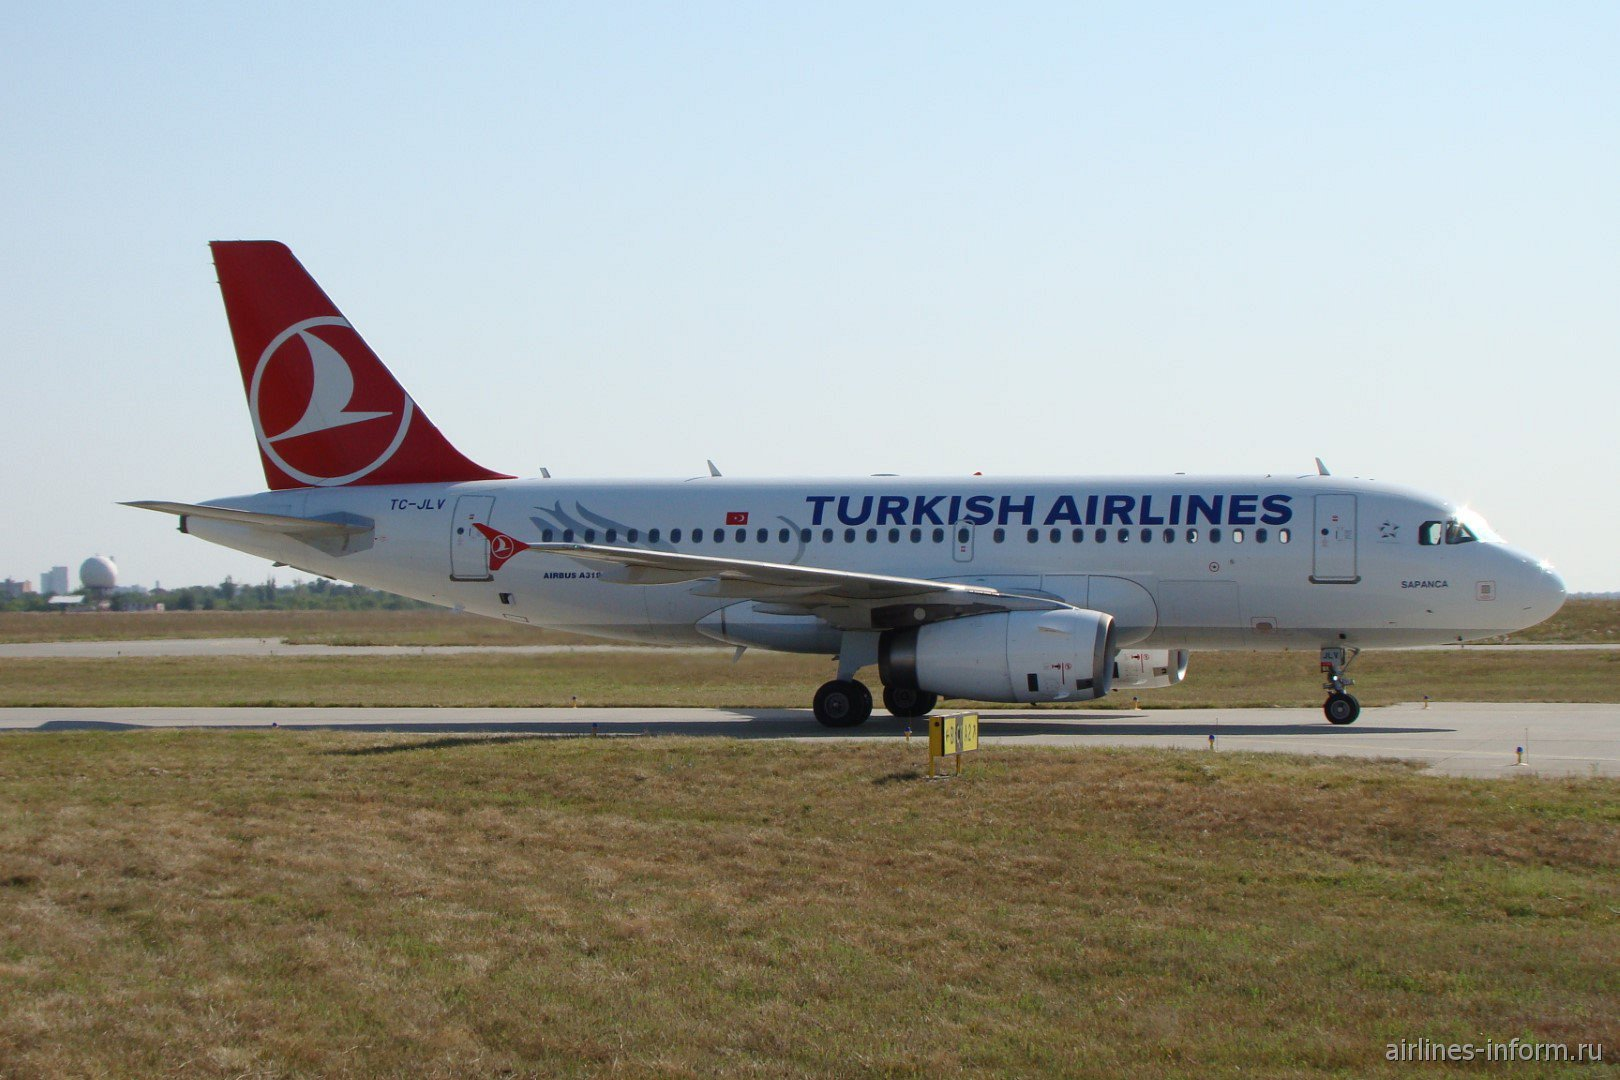 Самолет Airbus A319 TC-JLV Турецких авиалиний в аэропорту Харькова